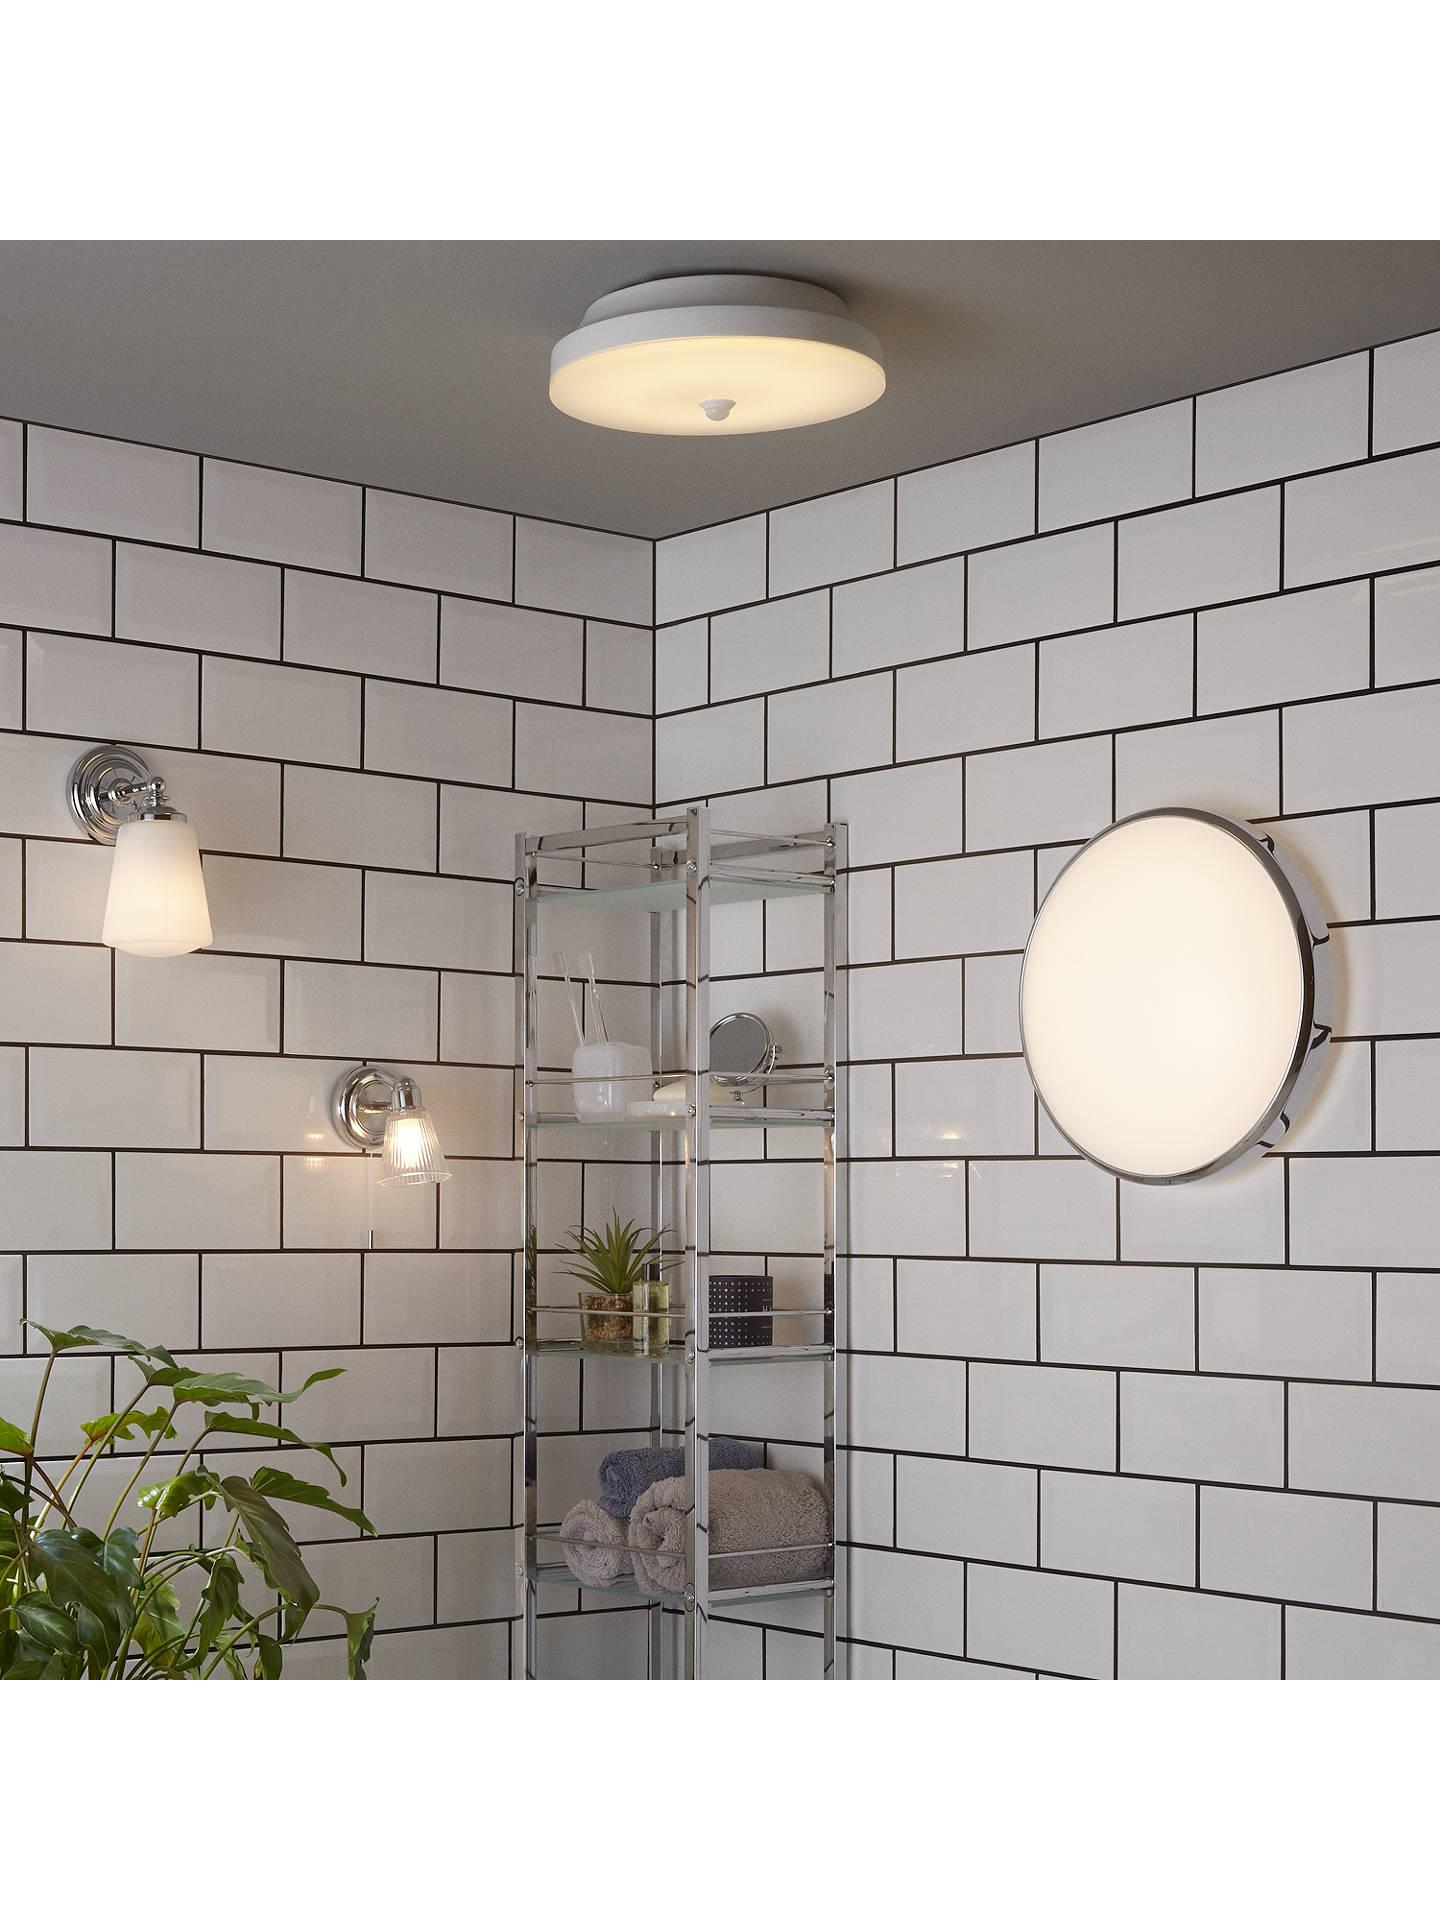 Nordlux Scala Led Sensor Bathroom Light At John Lewis Partners